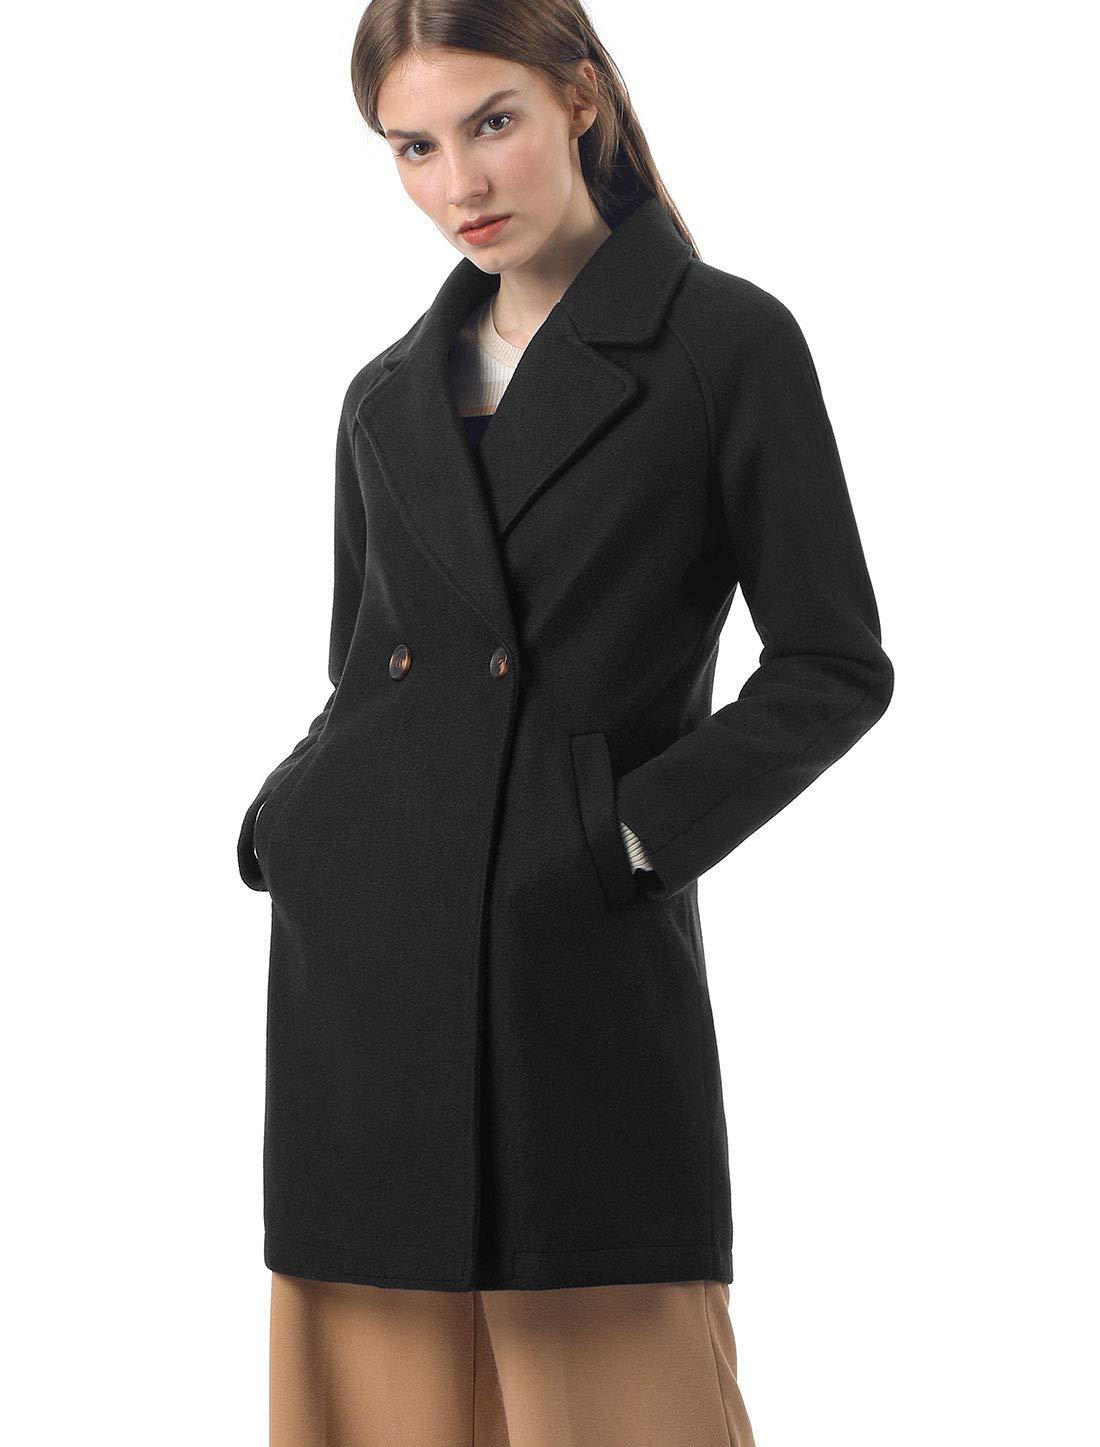 Allegra K Women's Notched Lapel Double Breasted Raglan Winter Coats